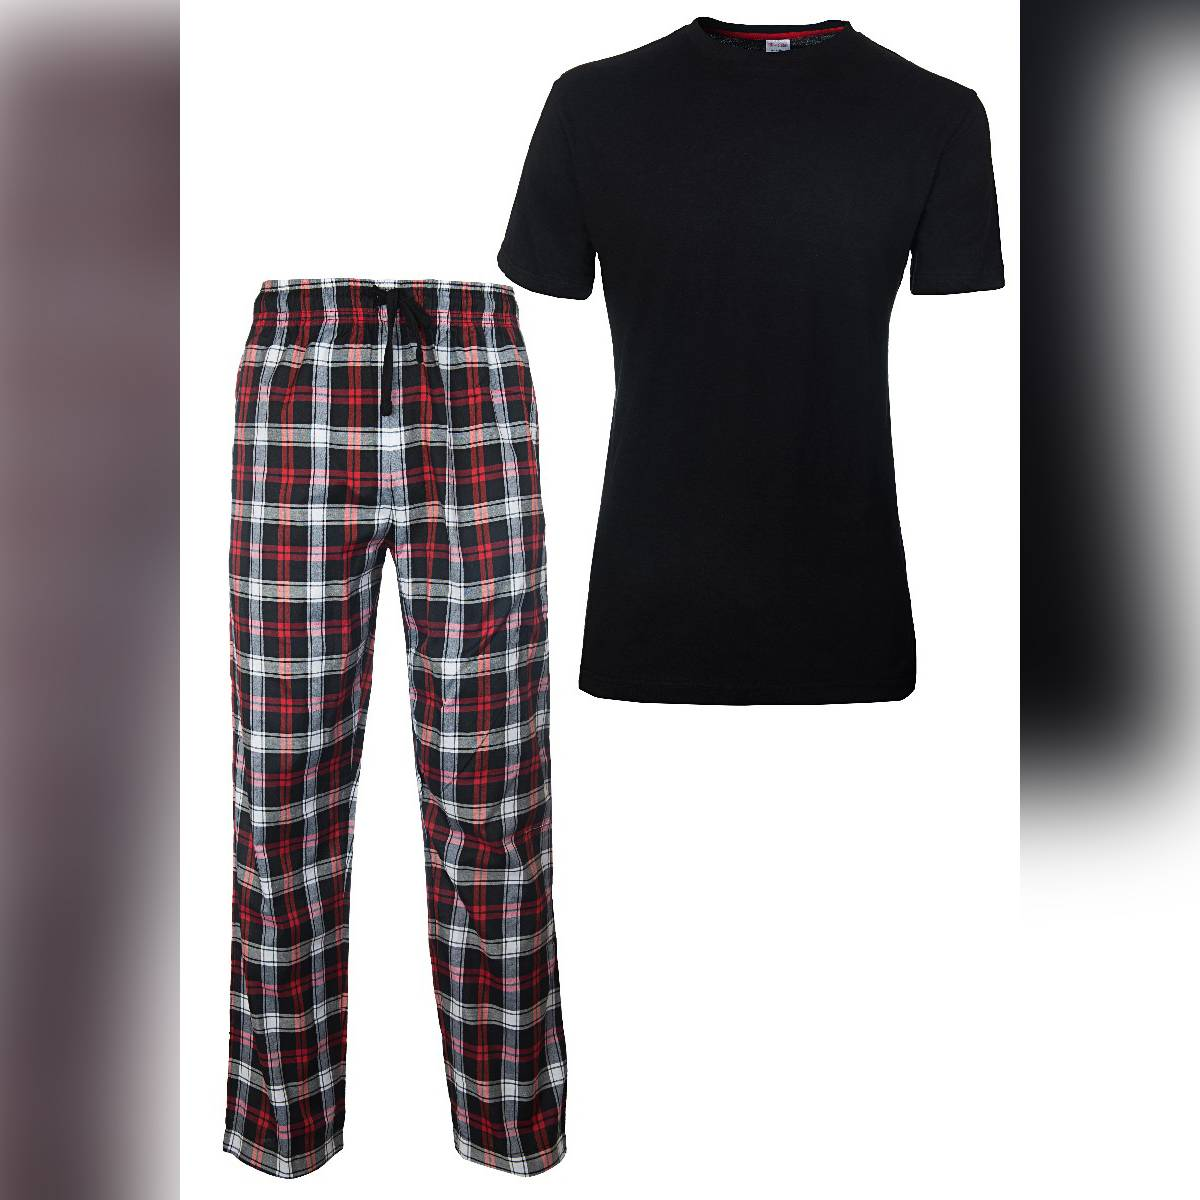 Men's New Pyjamas Set, Checked Pyjamas for Men, Men's Pj's Cotton Short Sleeves Round Neck T-Shirts, Woven Men's Pyjamas. NEW Men's CHECK Print Pyjama Set, Lounge Wear, Short Sleeve T Shirt Top, Night Wear. ~ Black 2